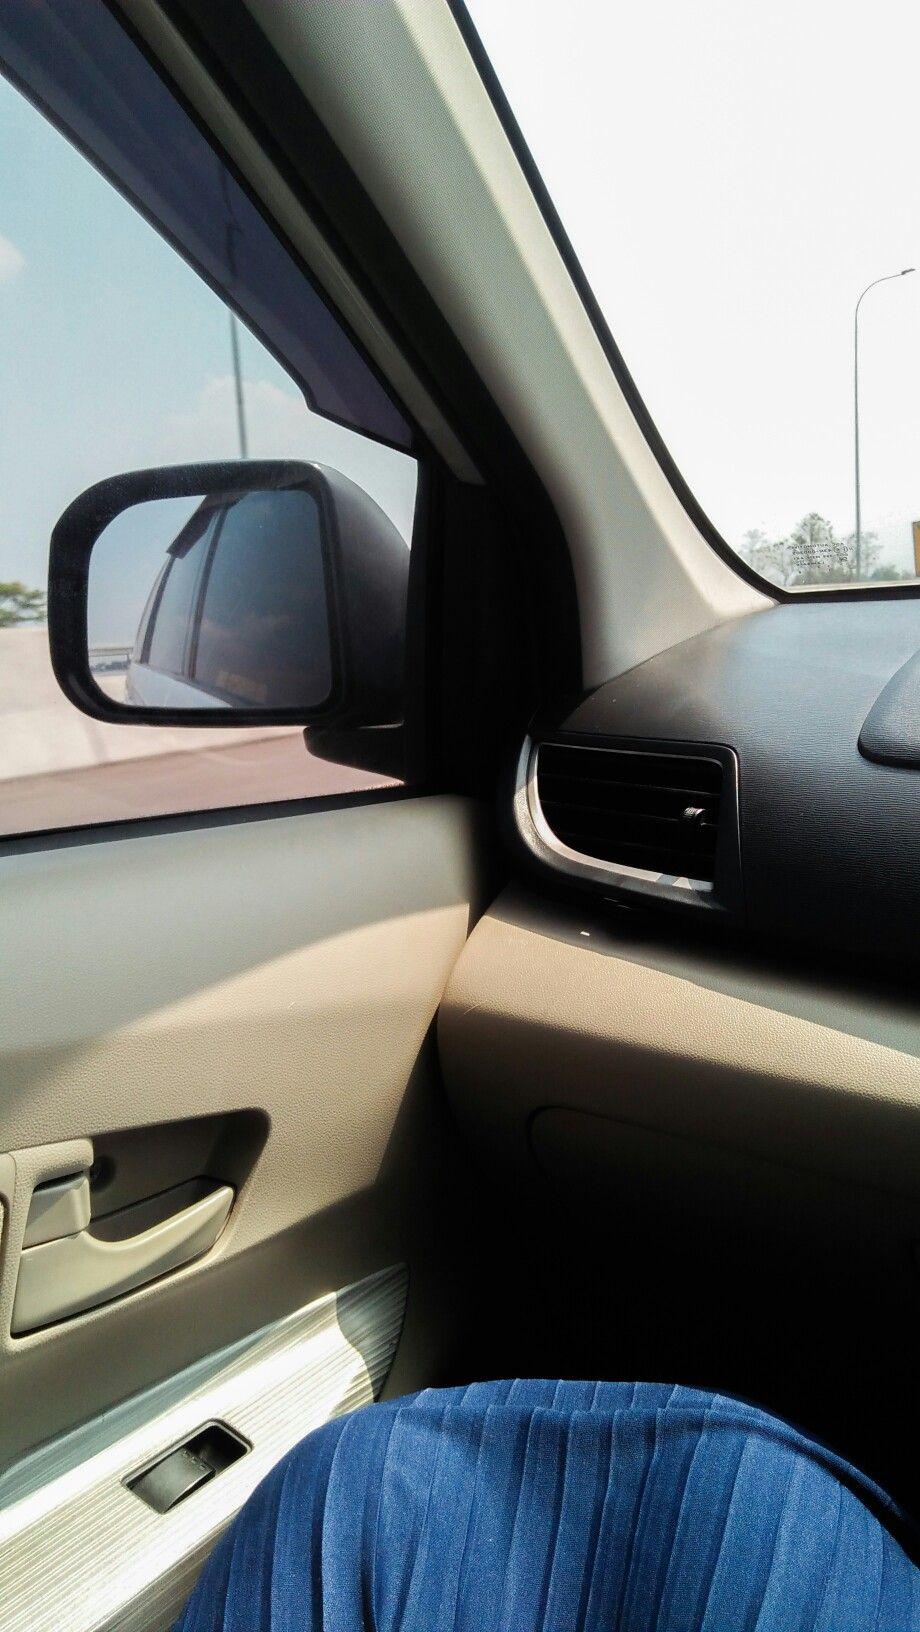 Gambar Kaca Mobil